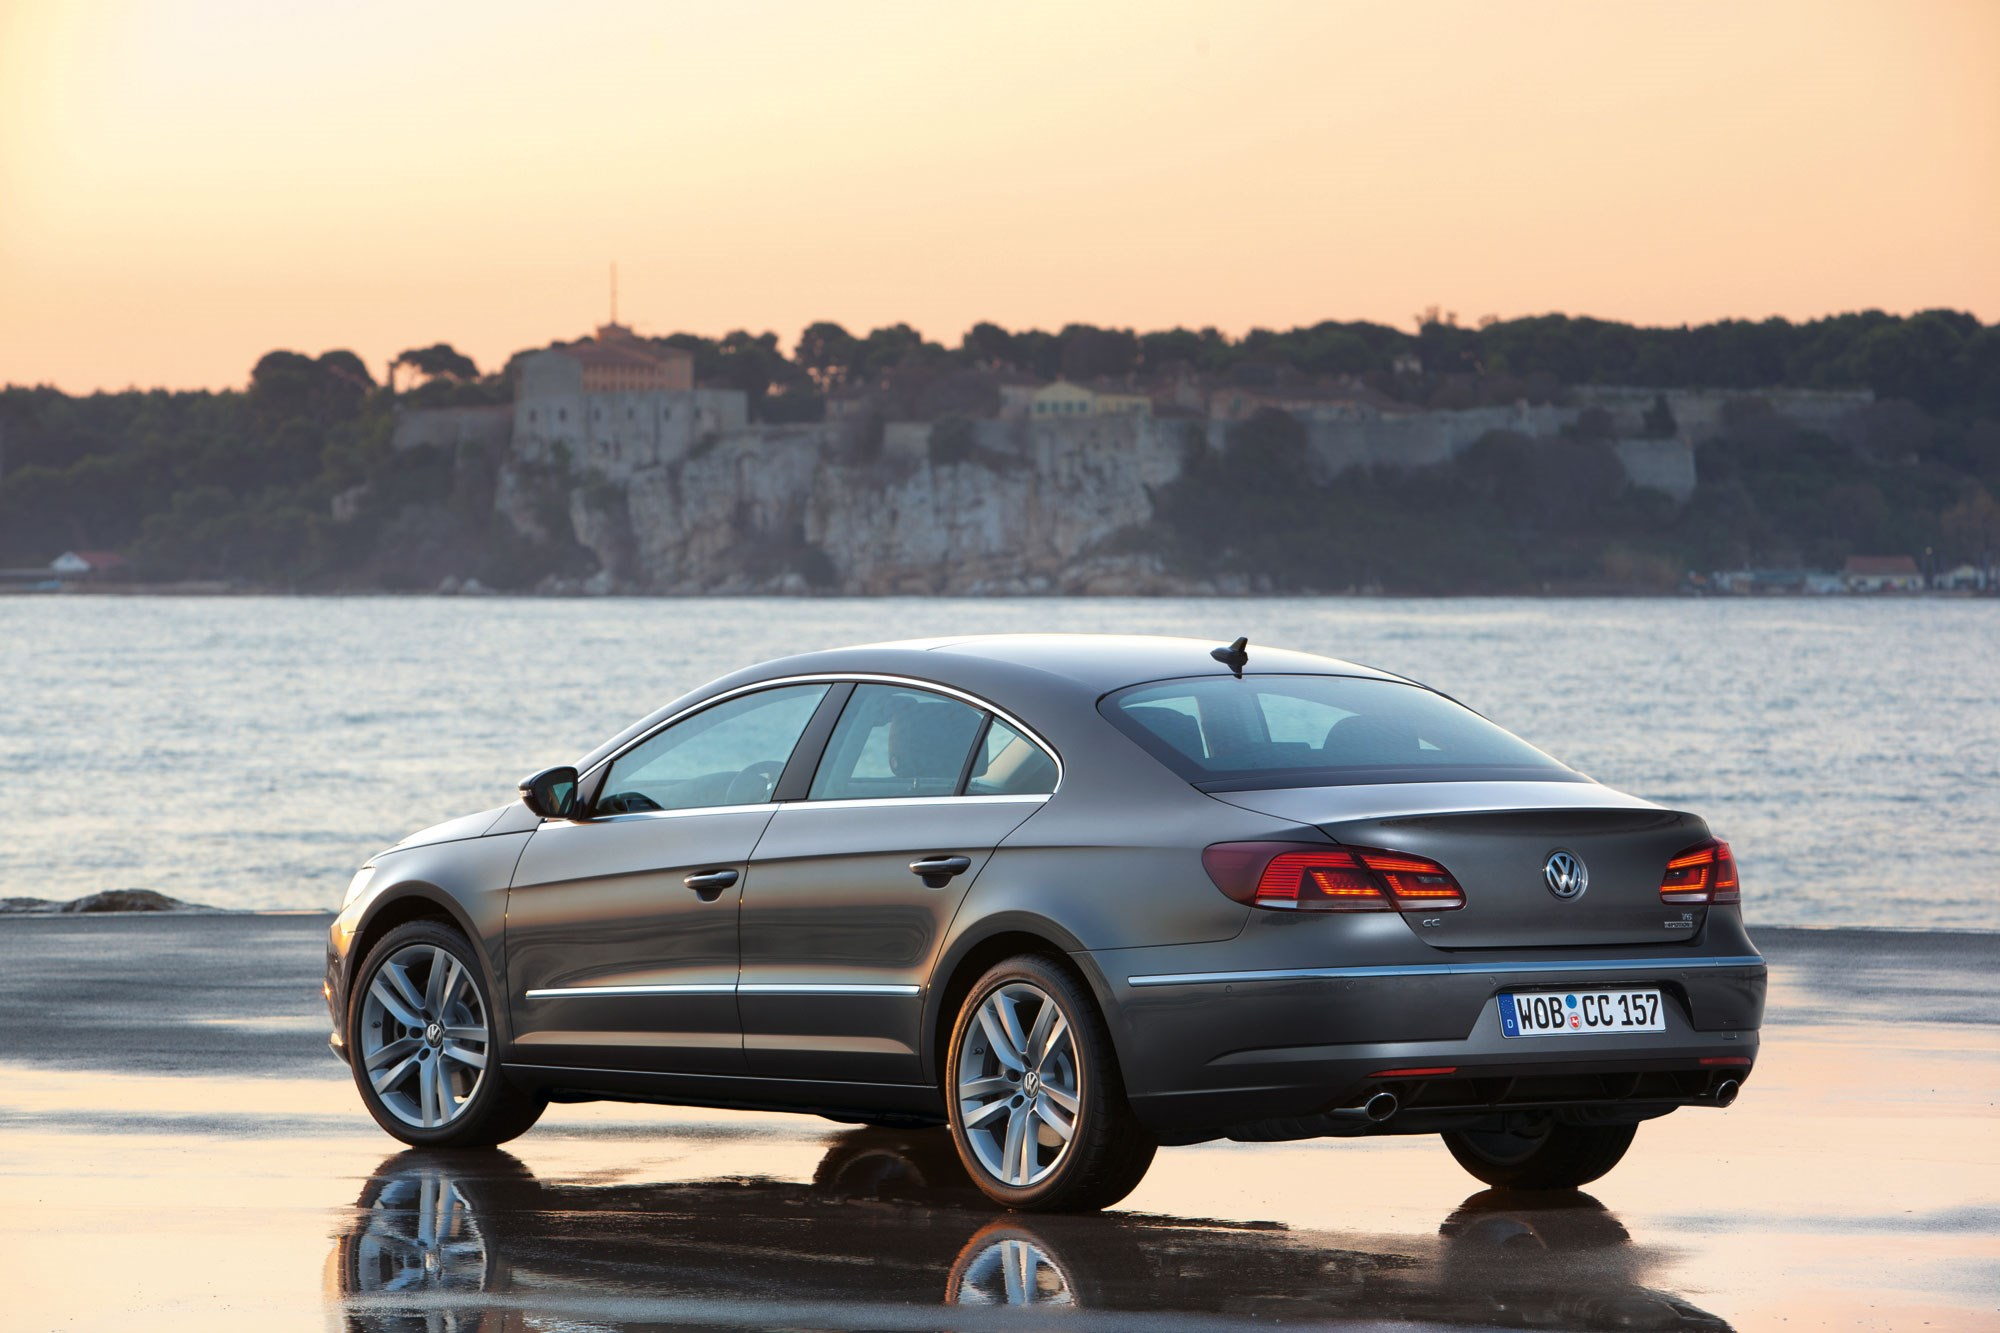 VW CC 20 TDI 177 DSG 2015 review by CAR Magazine